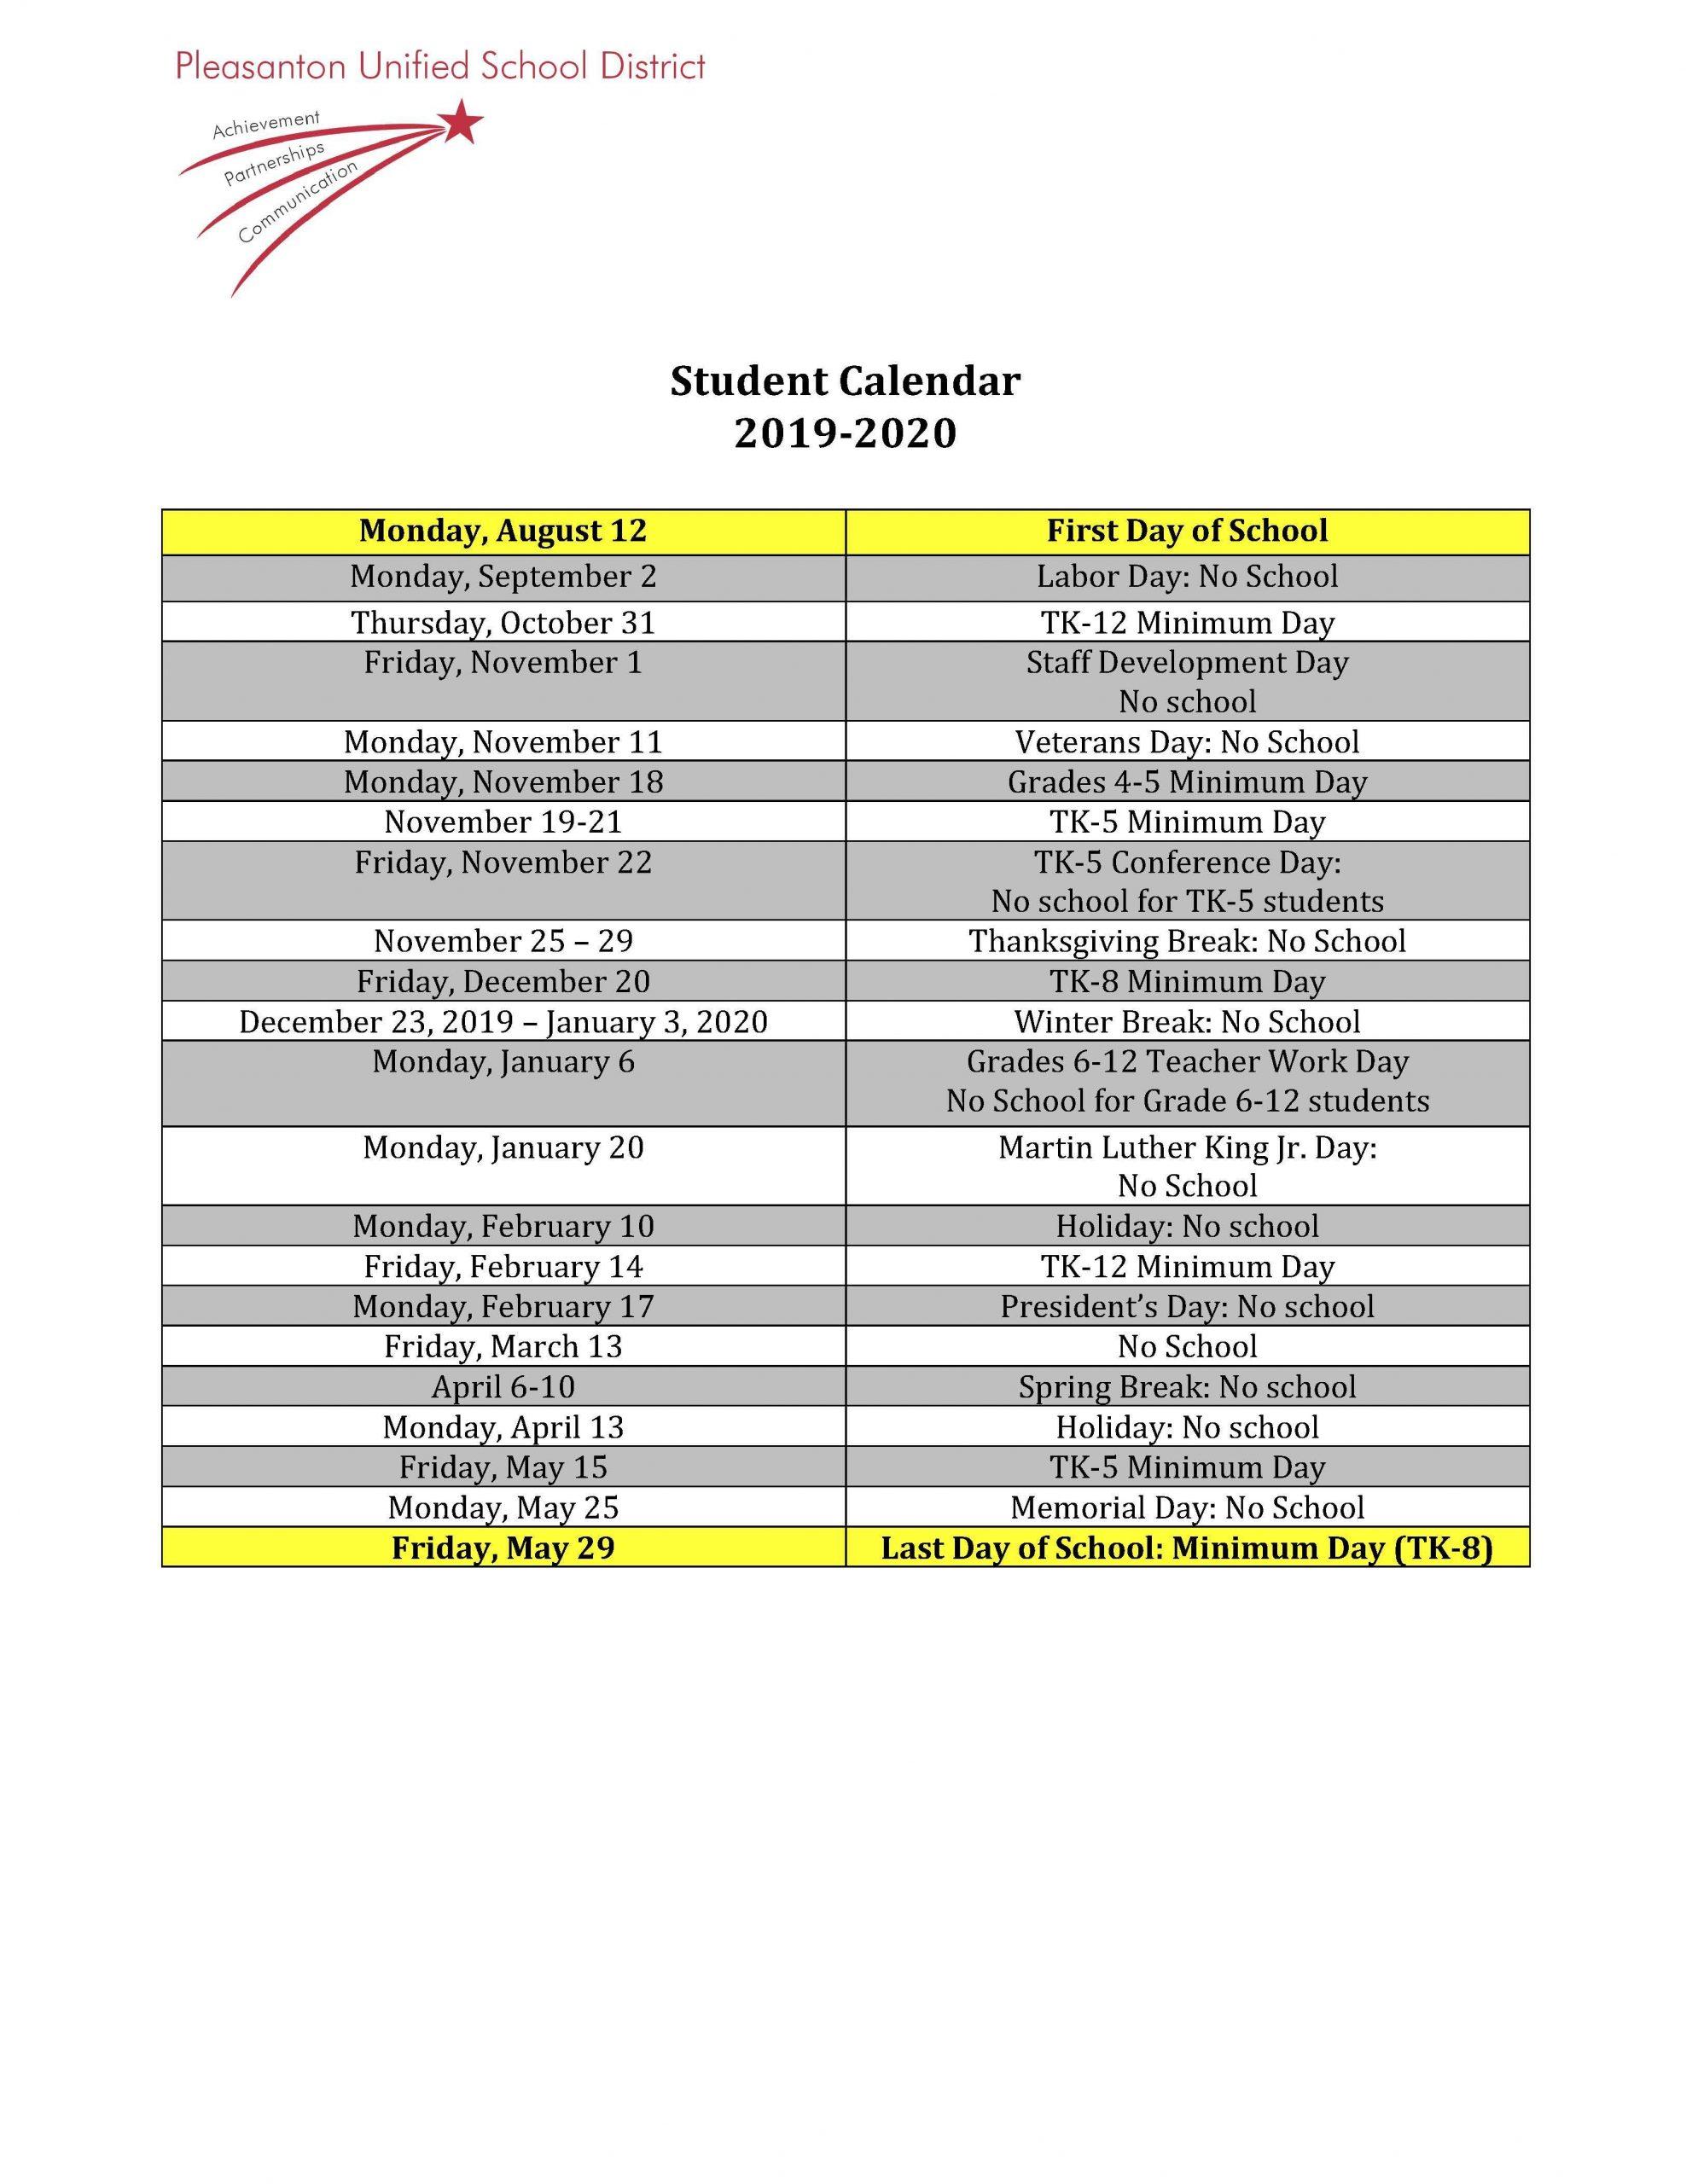 Calendars - Miscellaneous - Pleasanton Unified School District